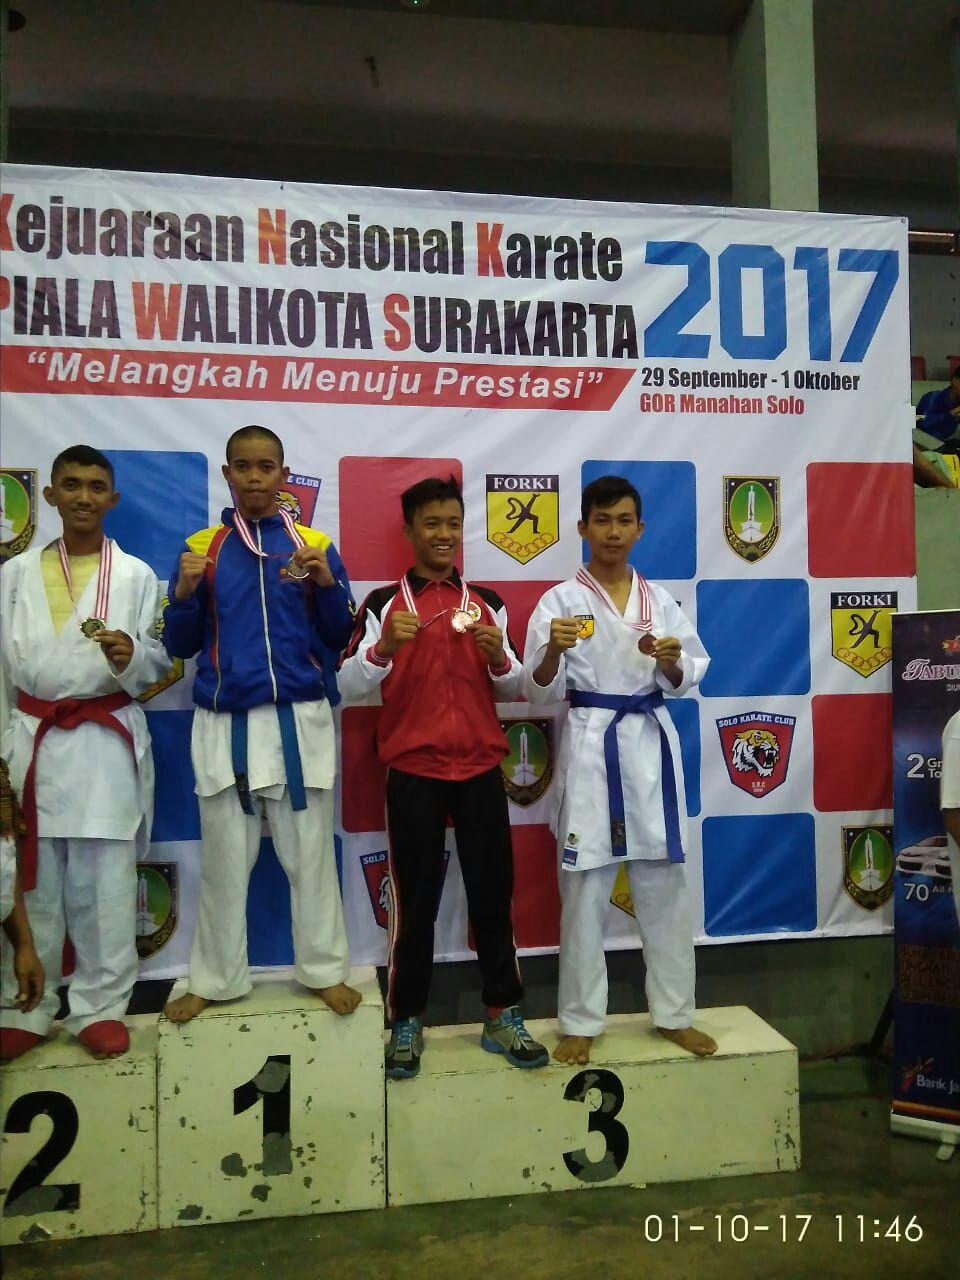 meraih-juara-3-3-medali-perunggu-kejurnas-karate-piala-walikota-surakarta-2017